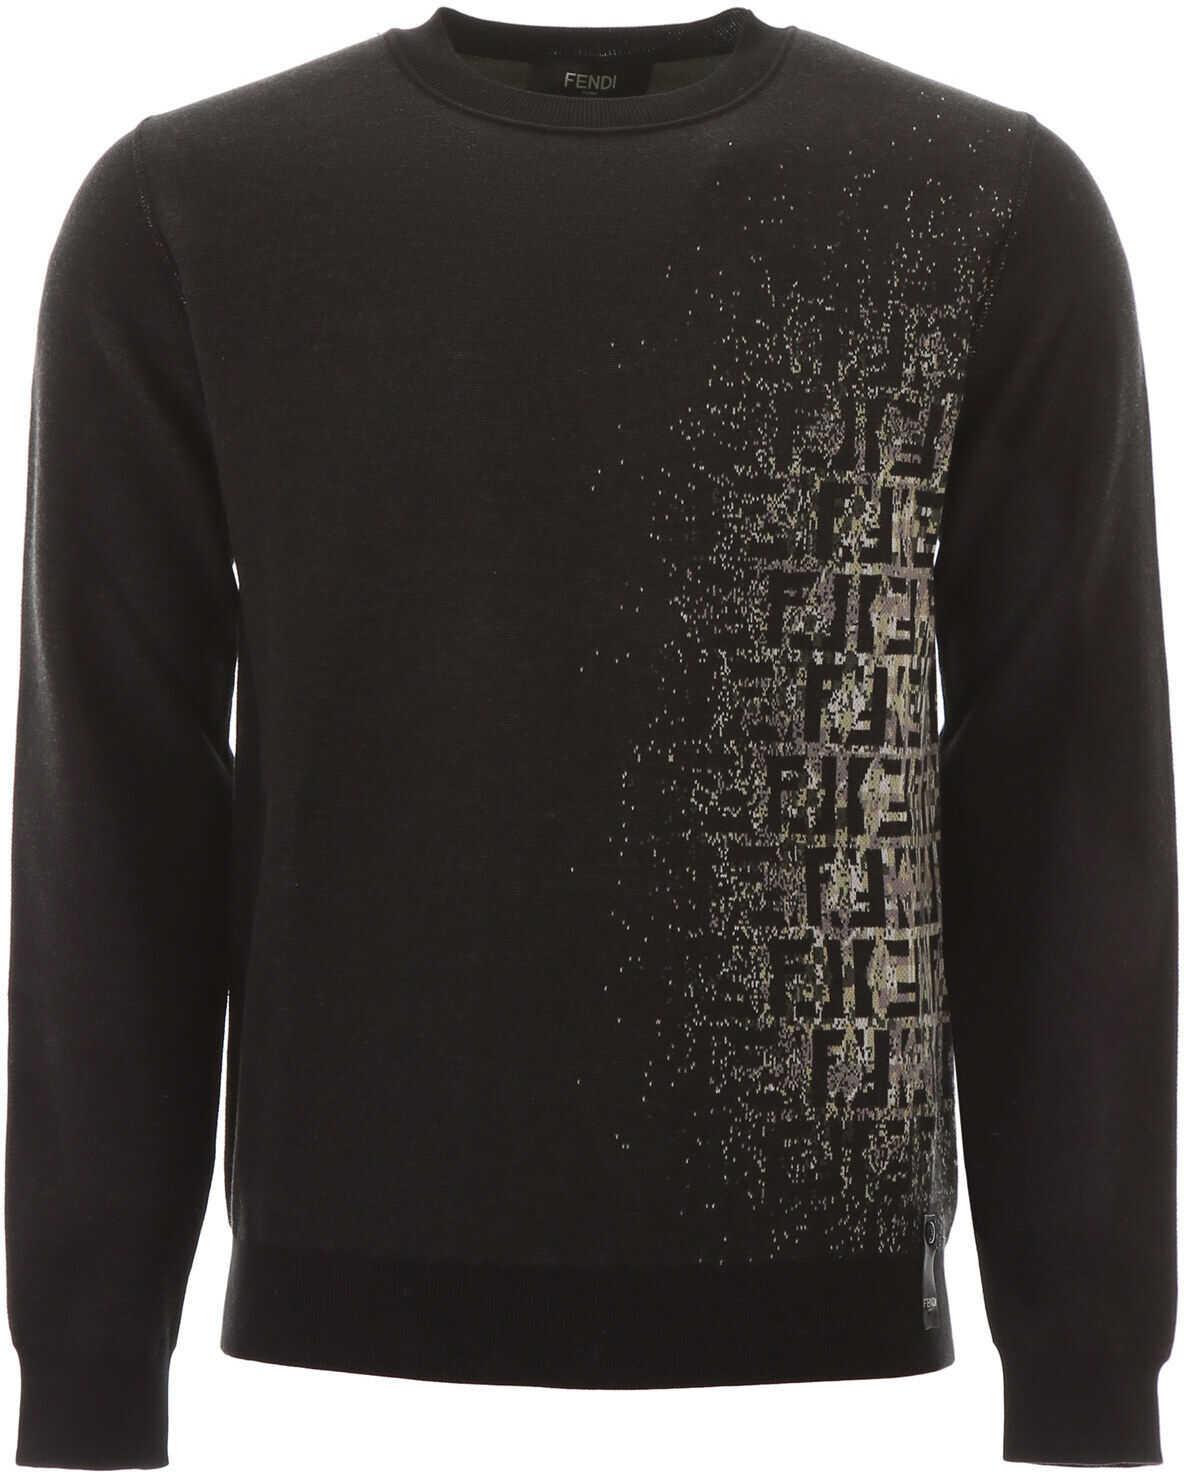 Fendi Pixel Ff Sweater NERO